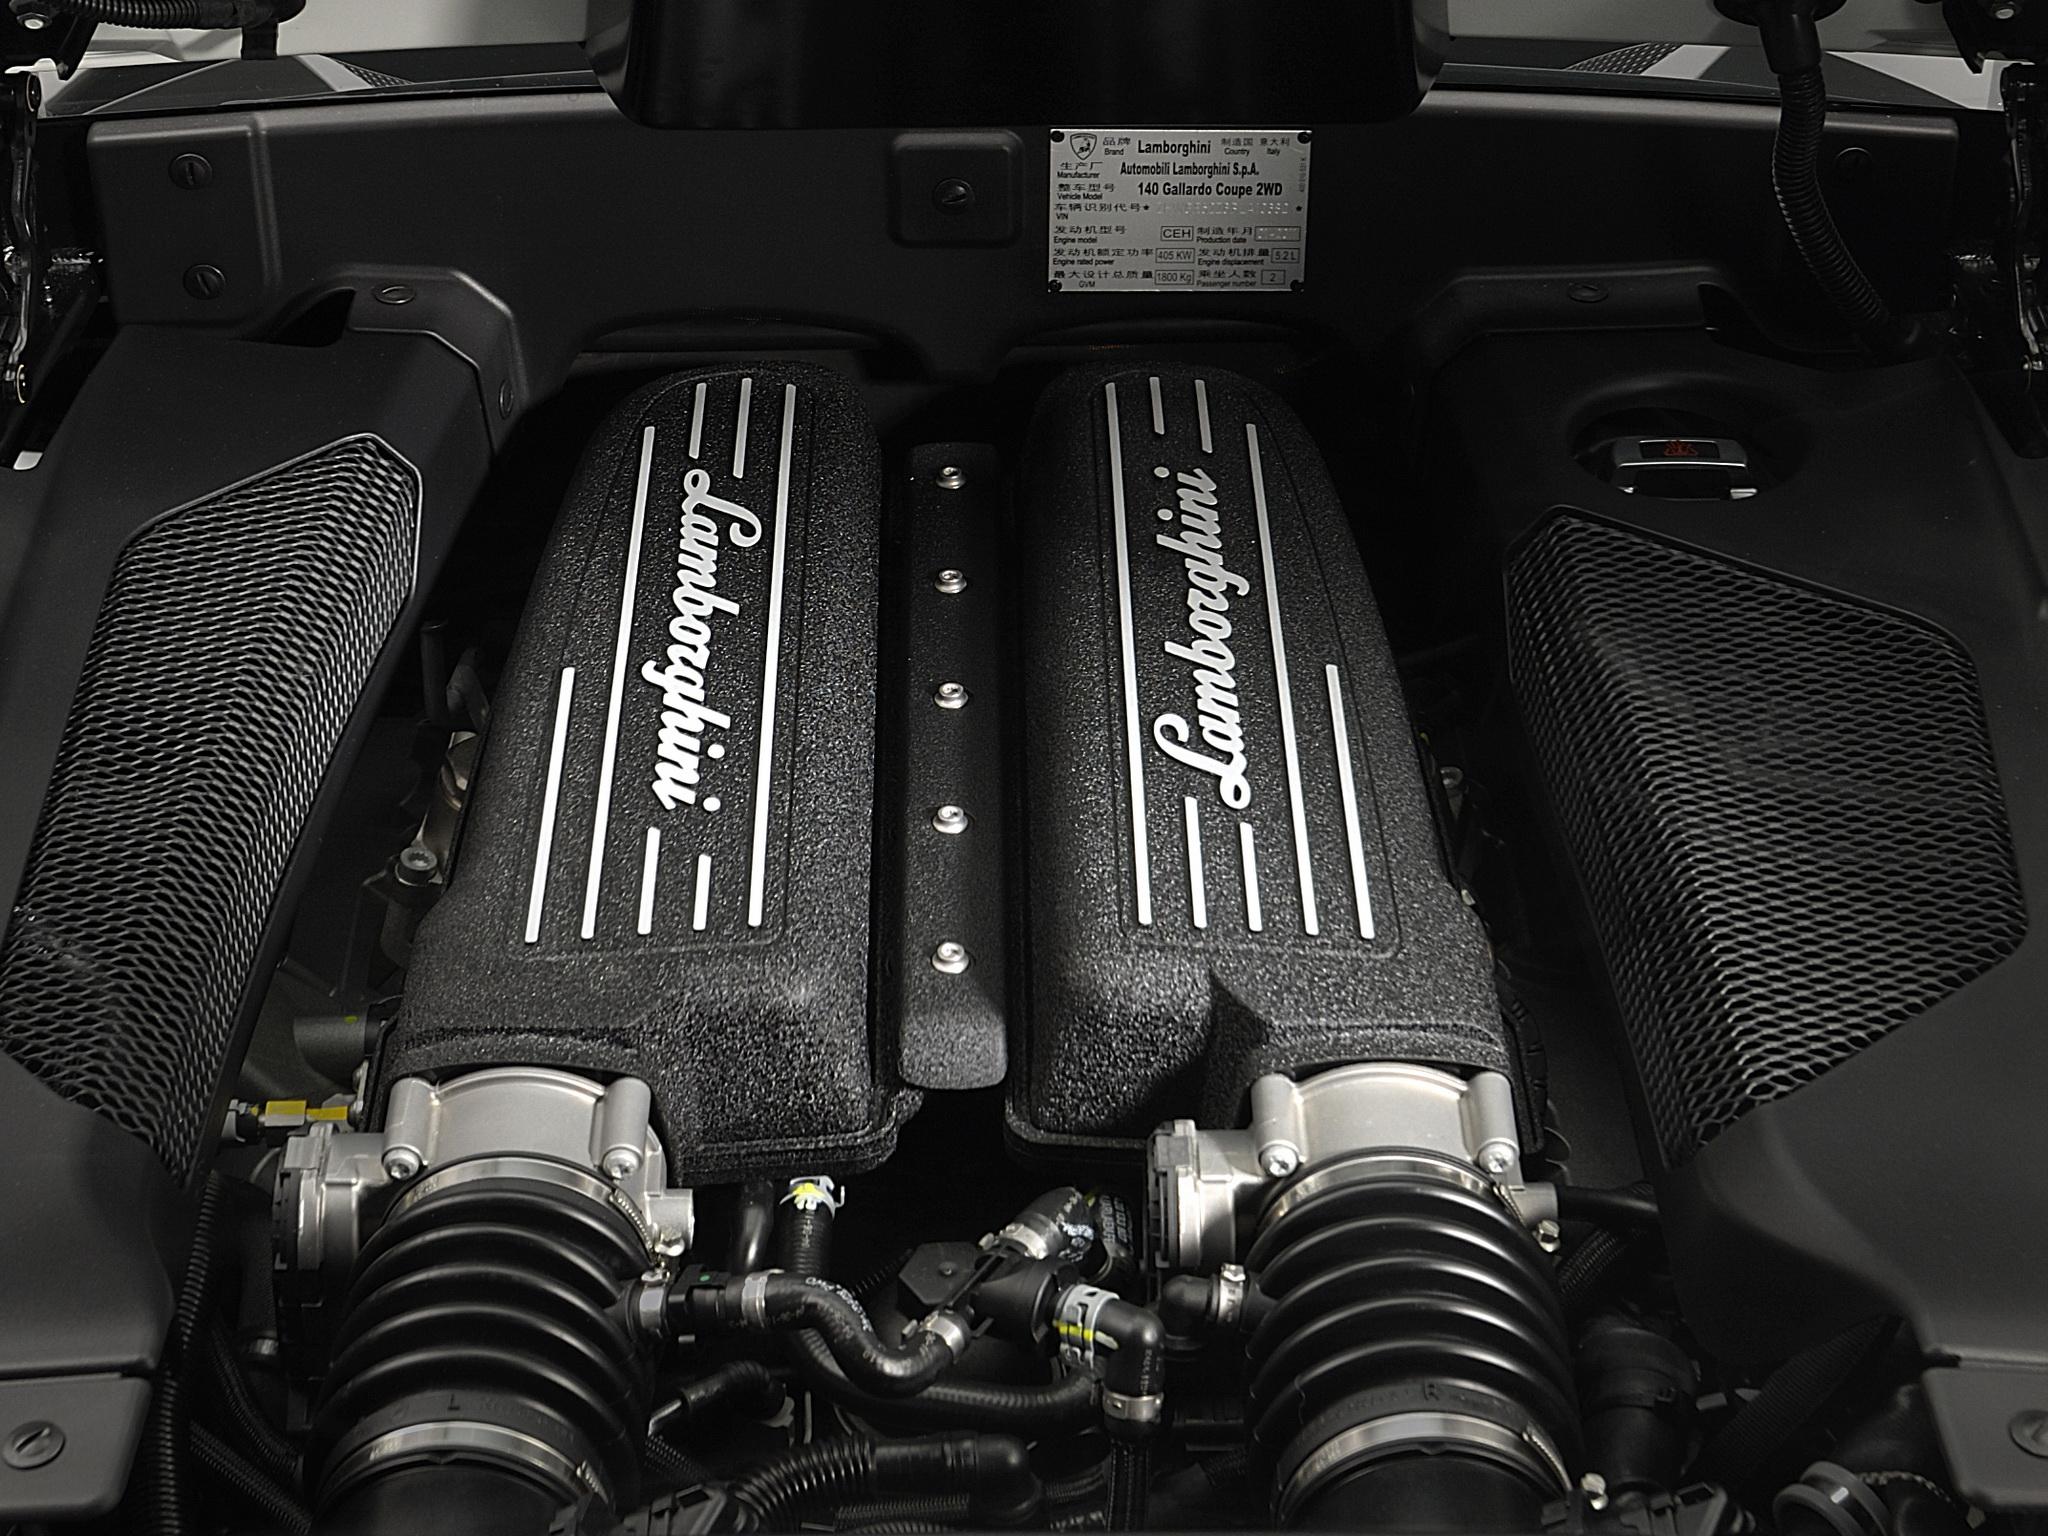 2011 Lamborghini Gallardo Lp550 2 Tricolore Supercar Supercars Engine Engines Wallpaper